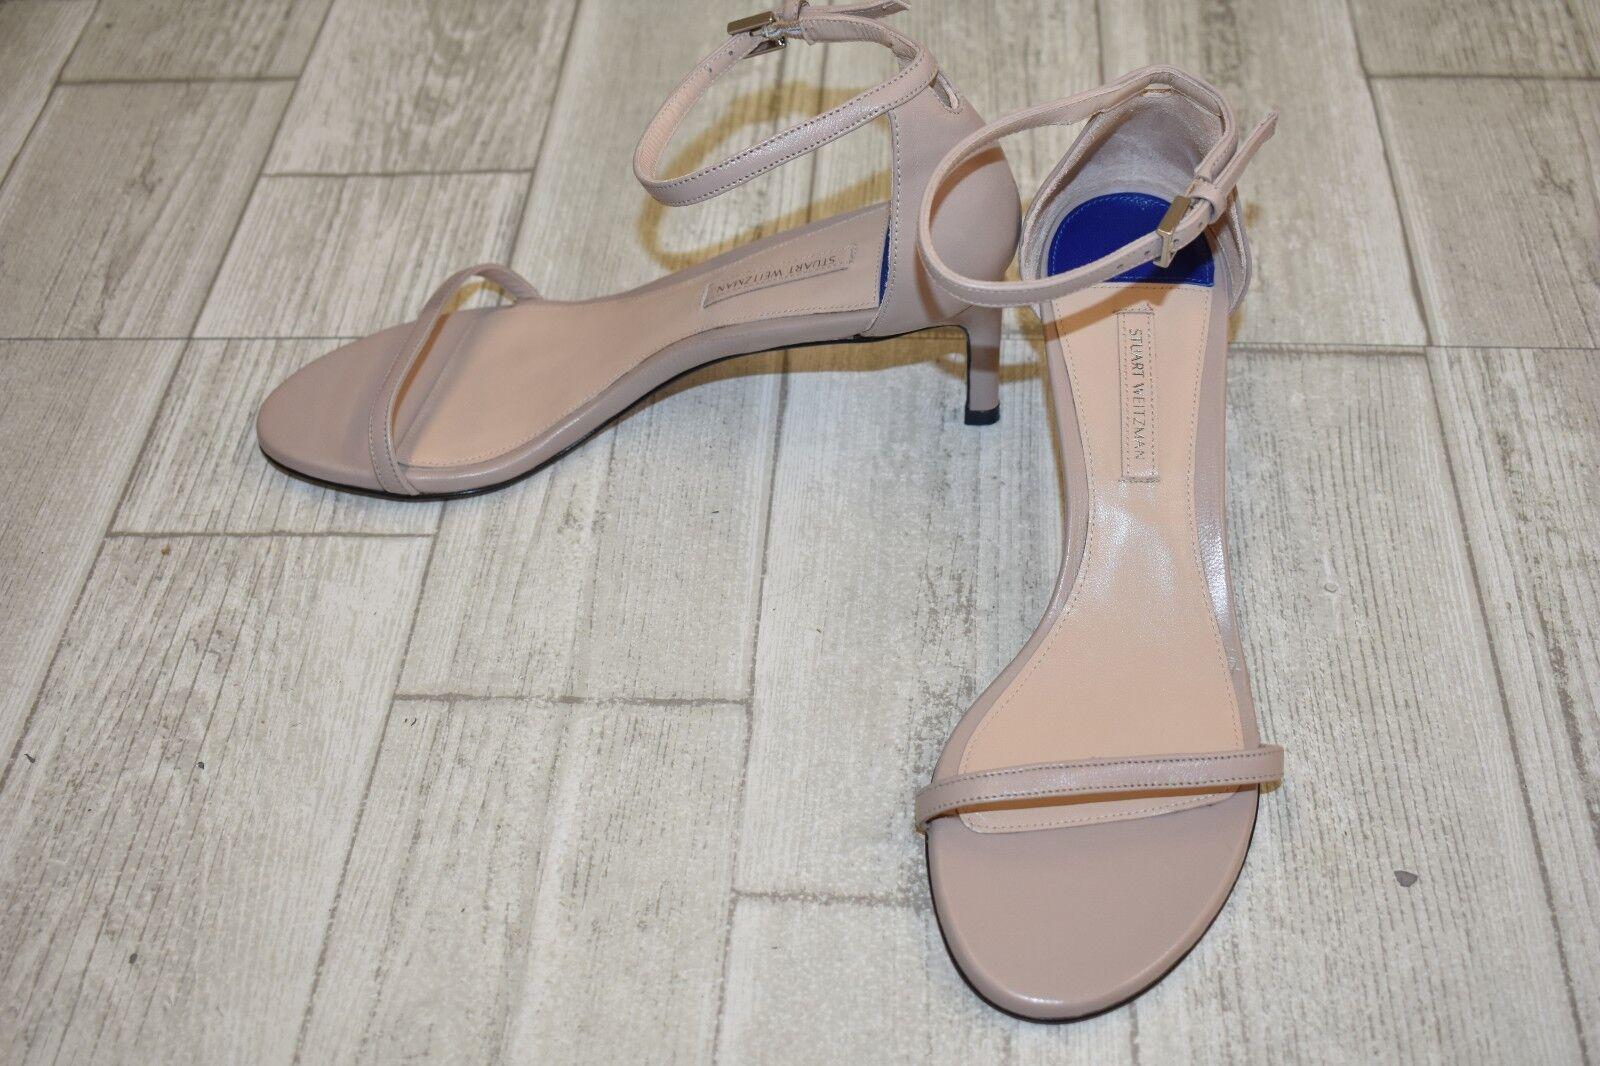 Stuart Weitzman 45 45 45 Nudist Traditional Sandals, Women's Size 7M, Latte Reims 13cb0b